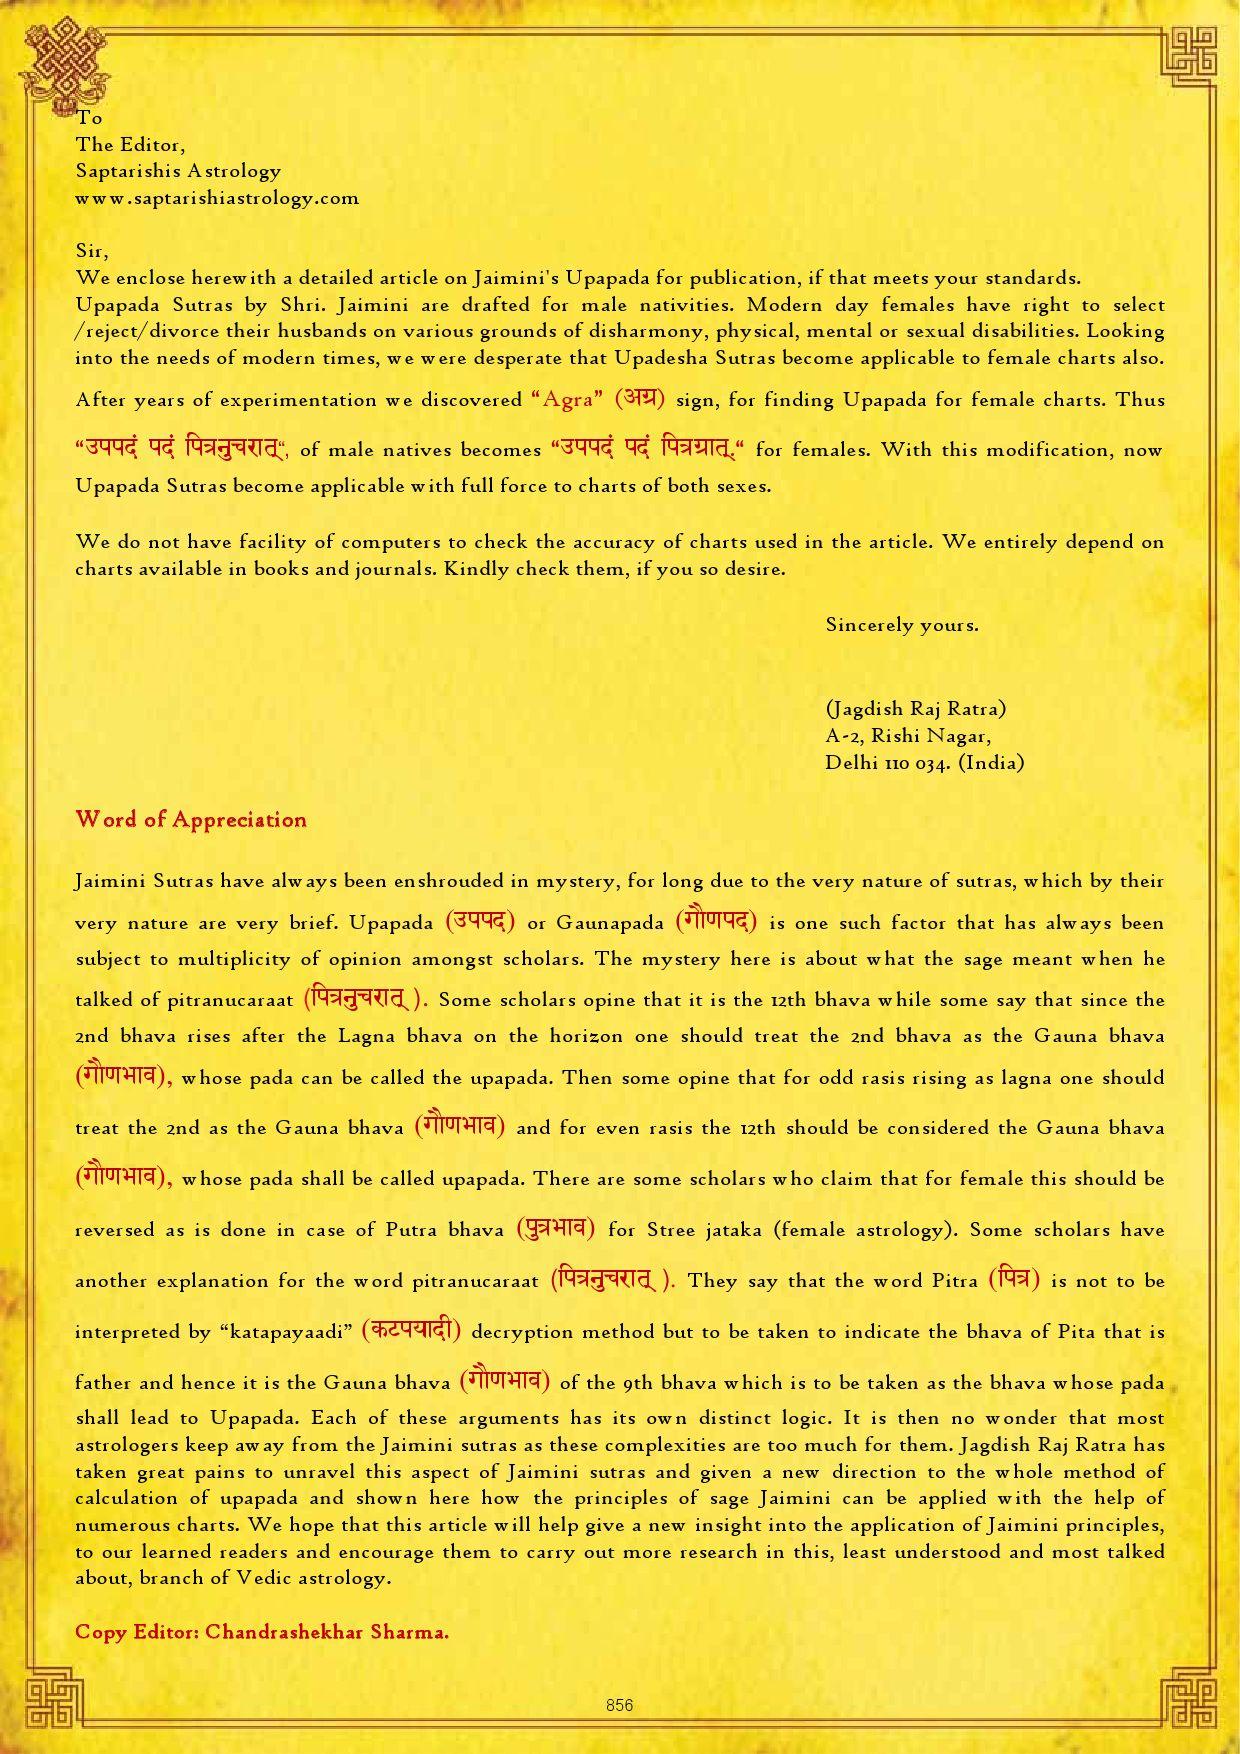 78 upapada anovelexposition by saptarishis astrology issuu nvjuhfo Choice Image